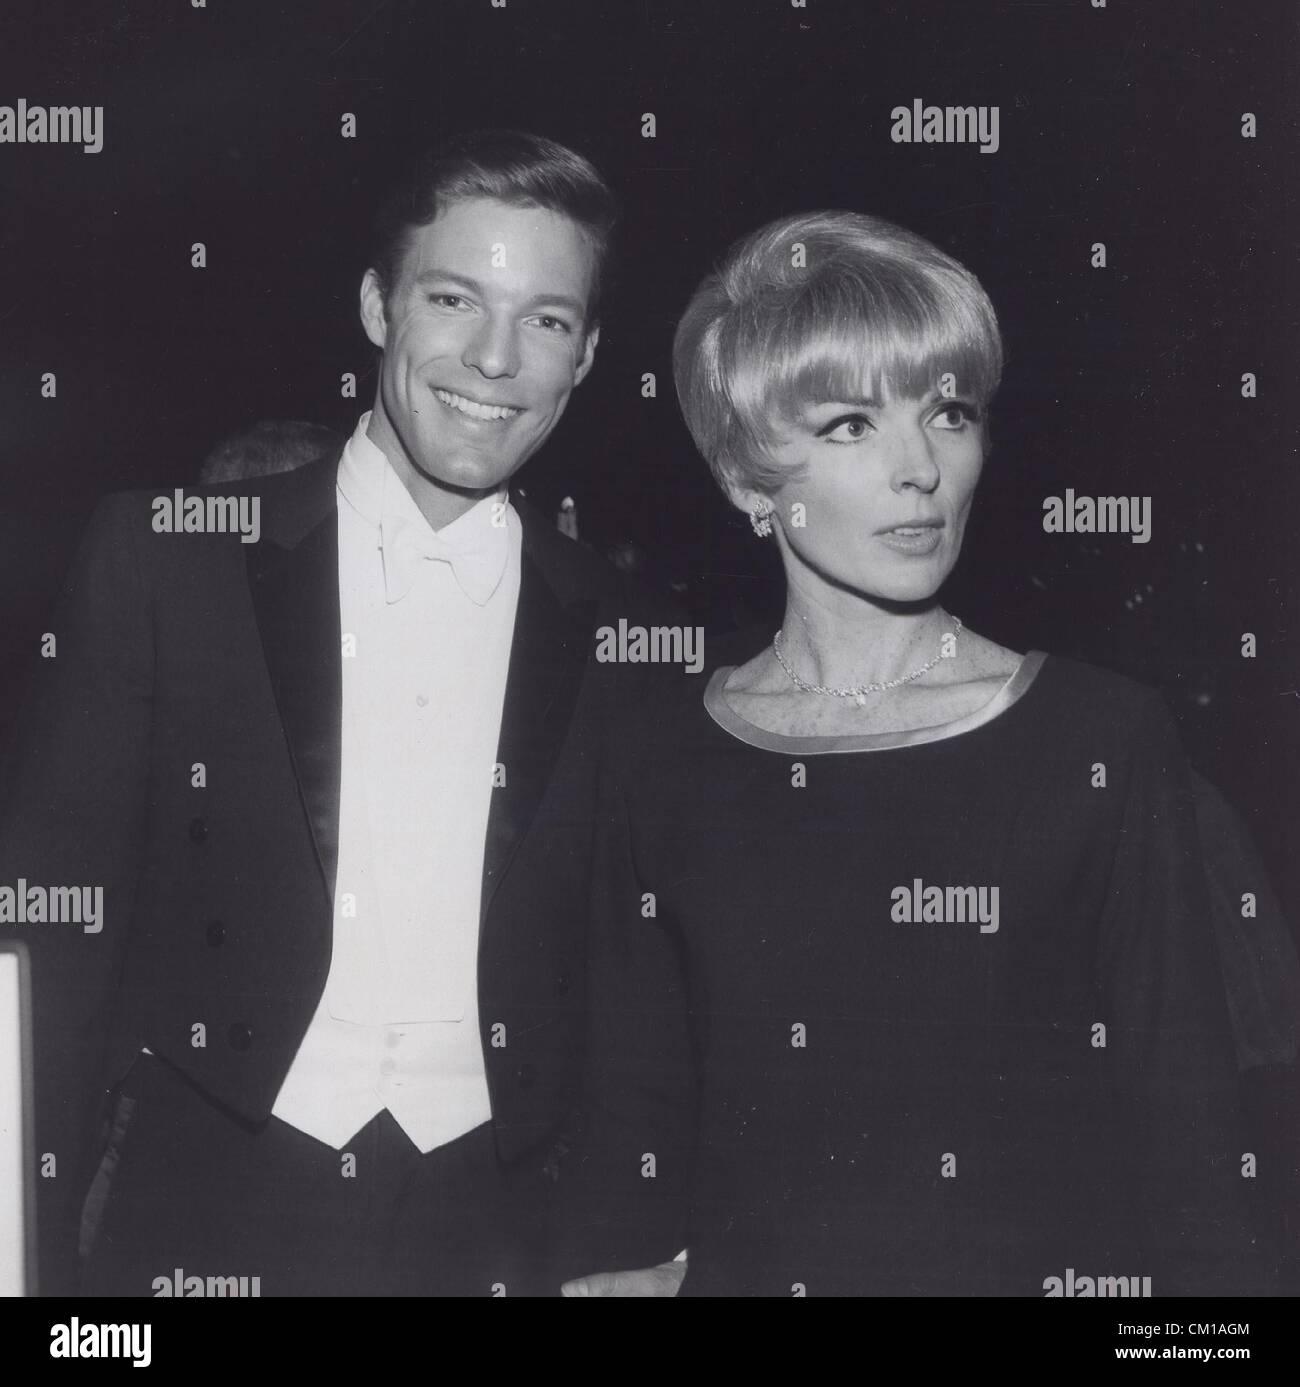 Rosemary Leach (1935?017),Anja Coleby XXX fotos Jonathan Rhys Meyers (born 1977),Beatrice Van